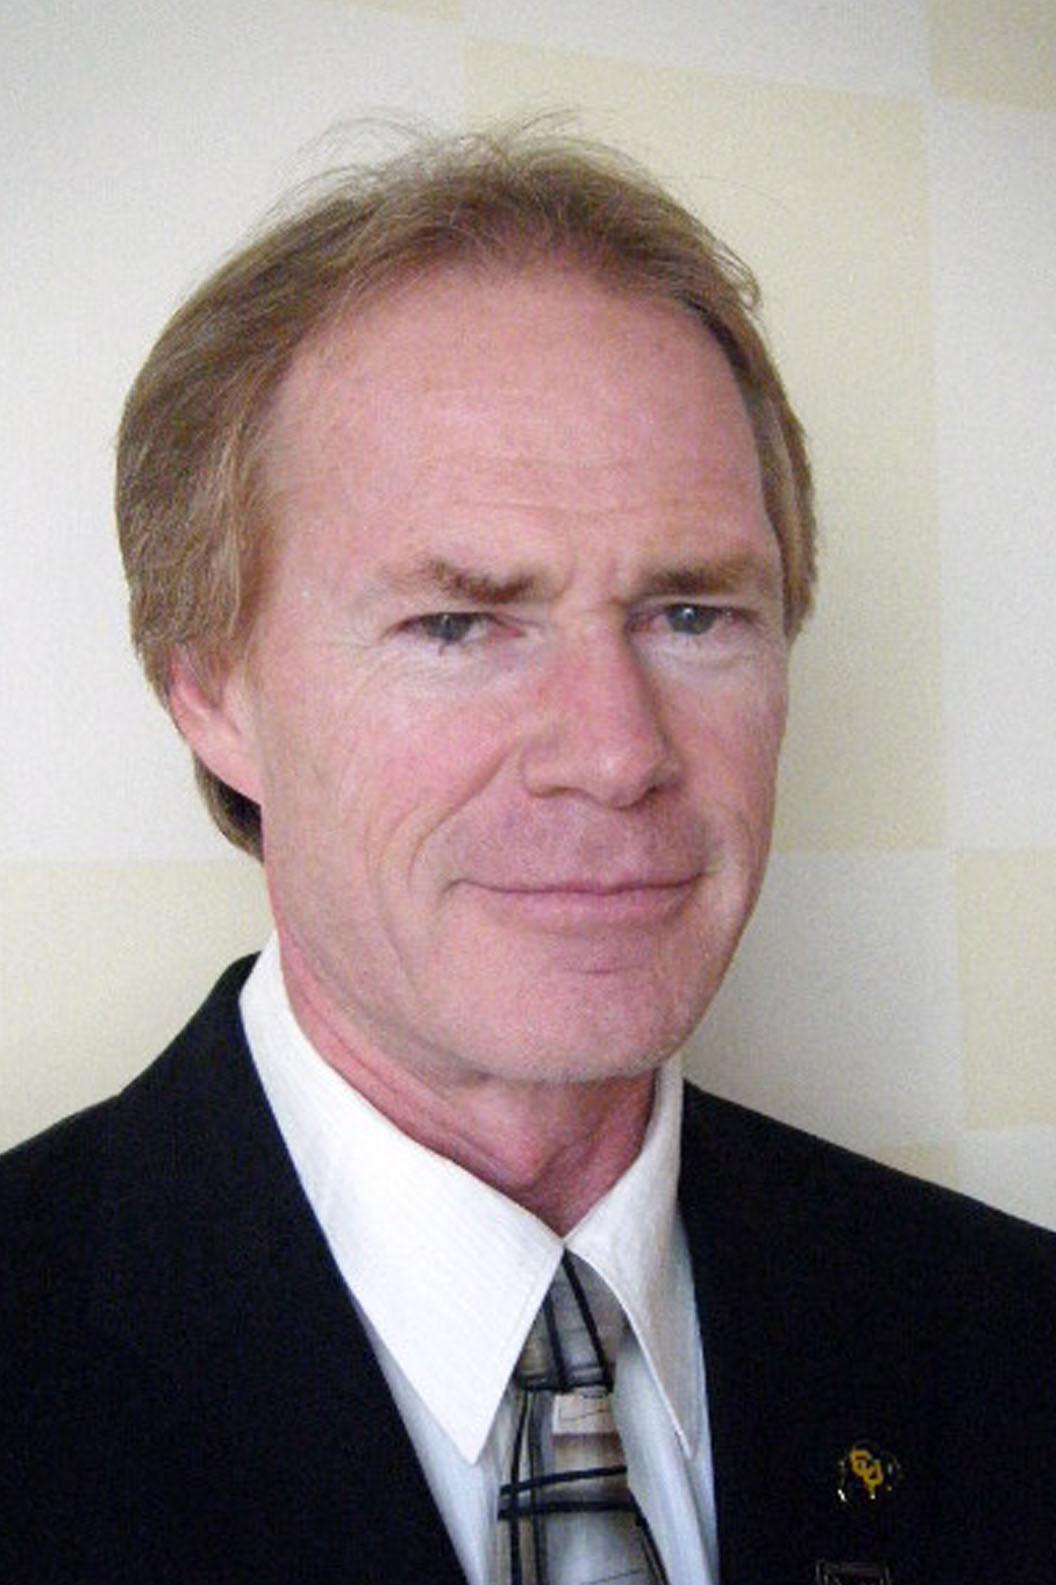 headshot of John Morris (BOK)